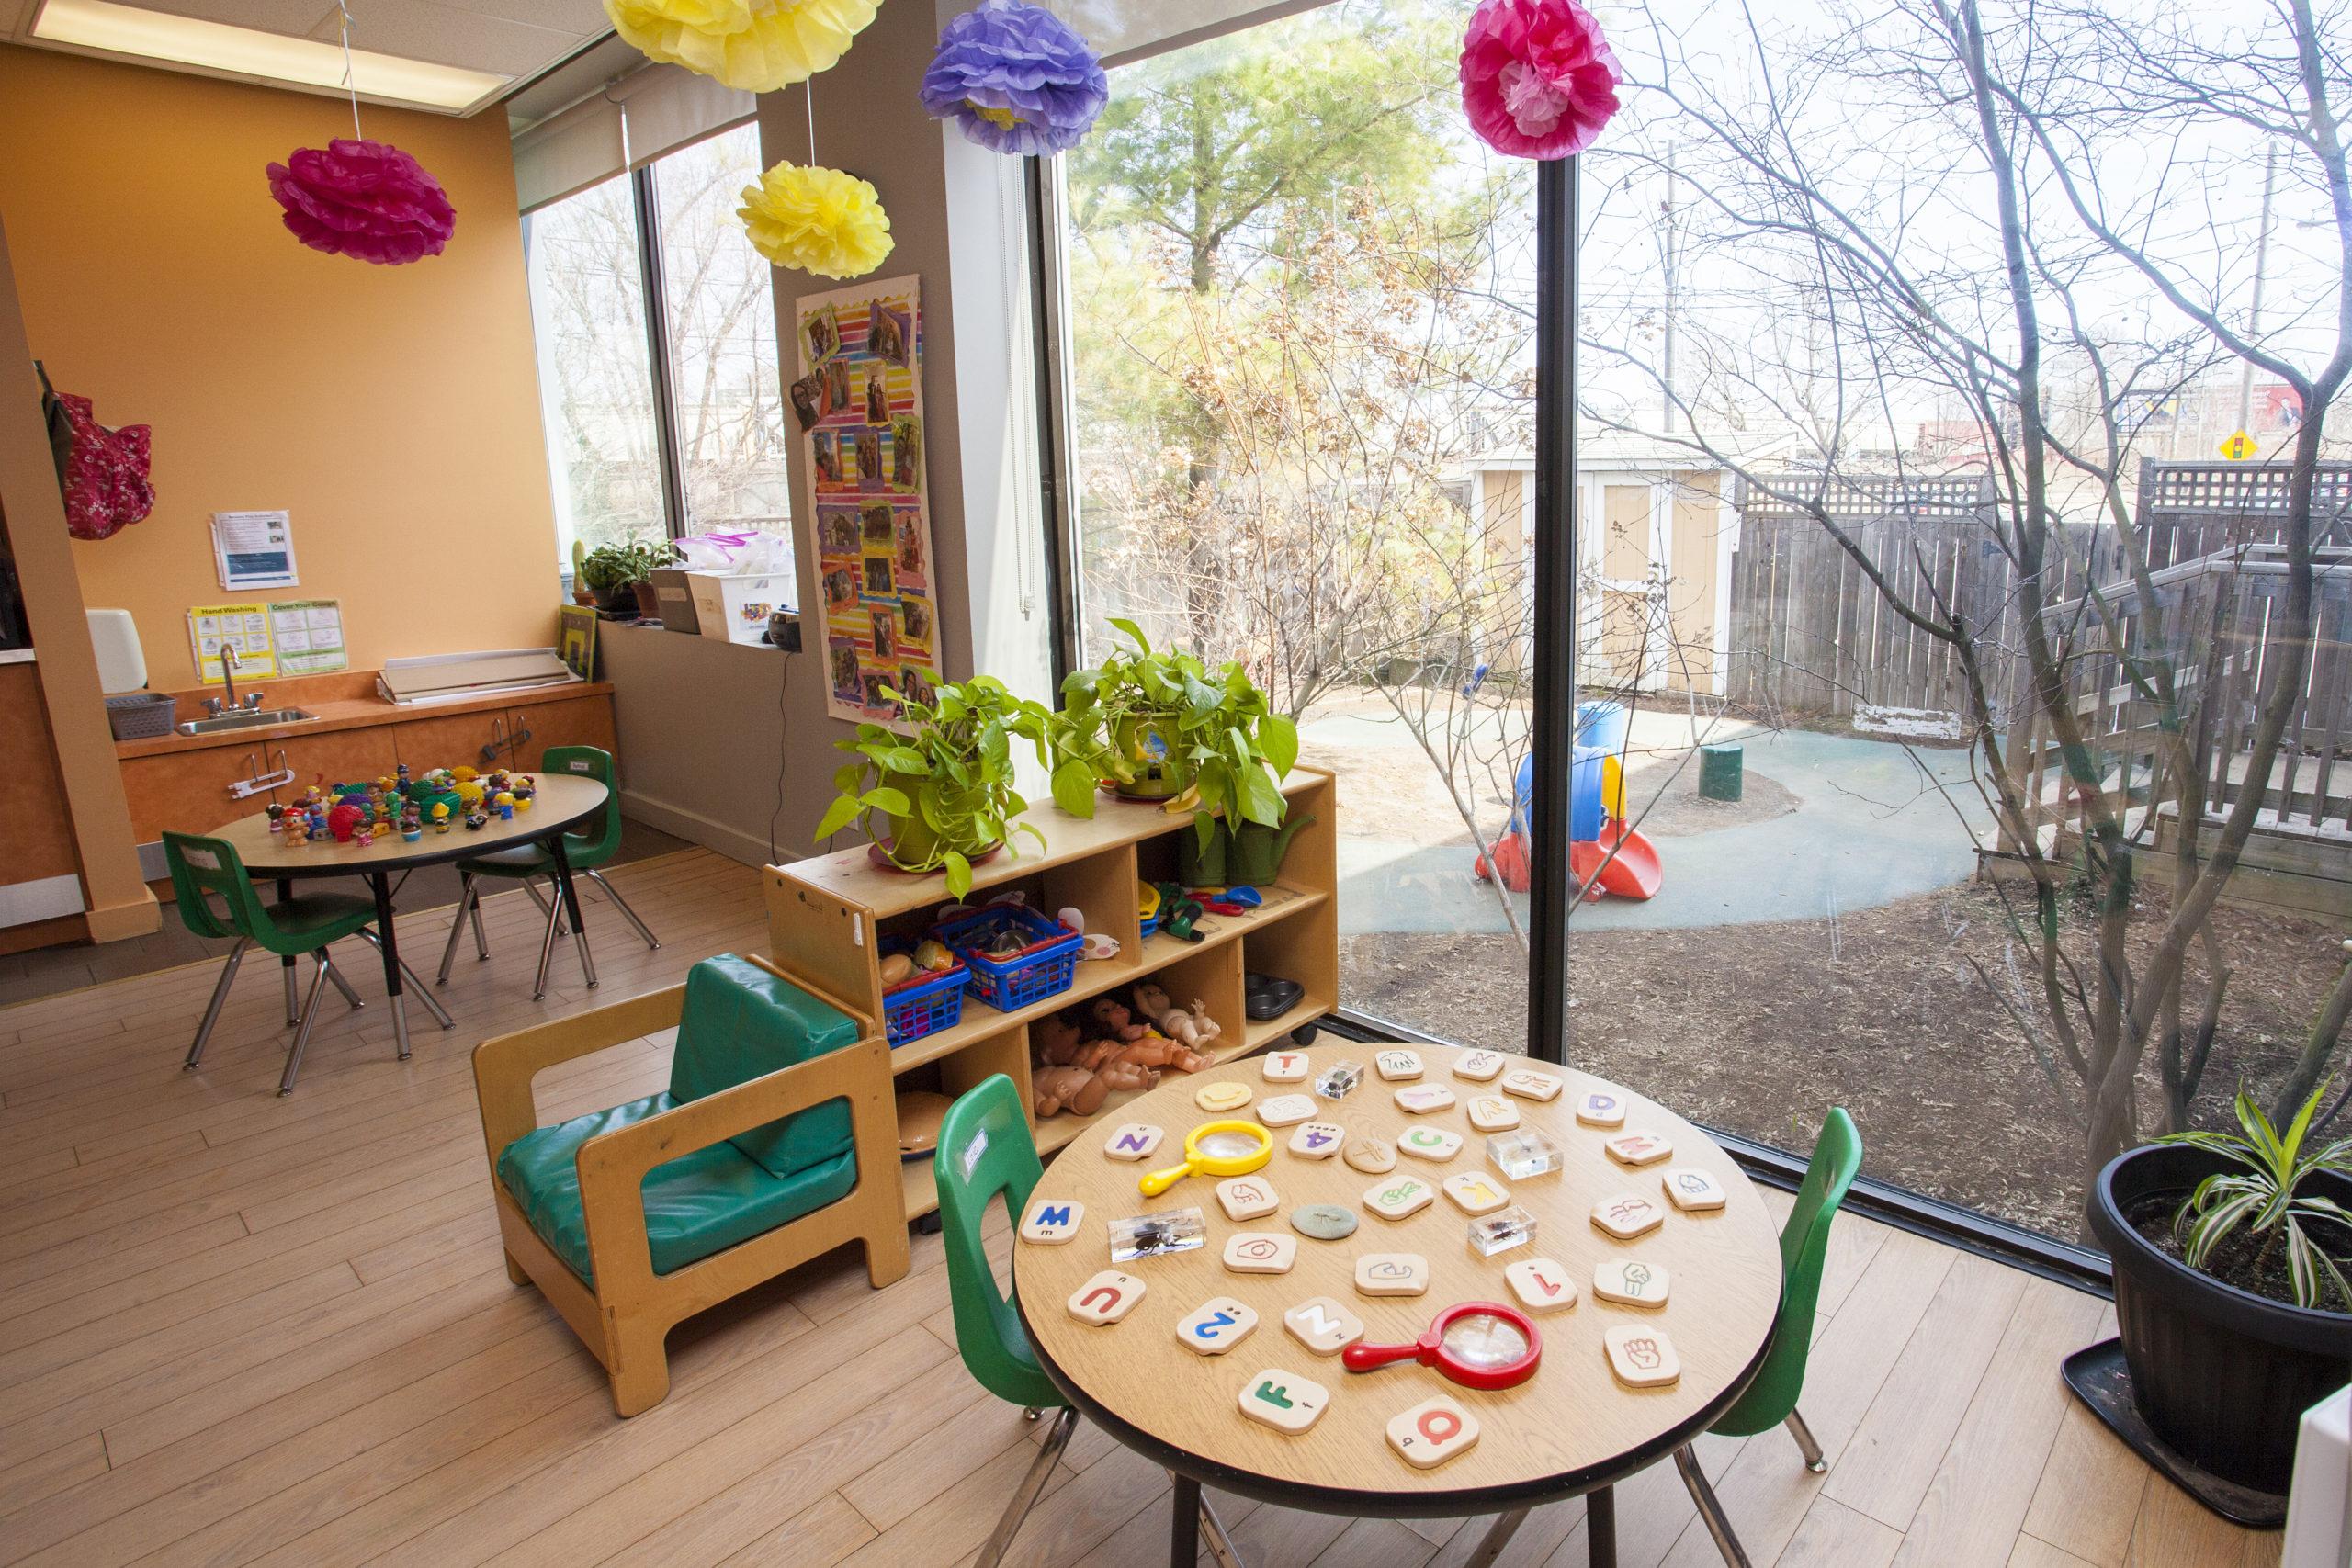 preschool classroom with tables